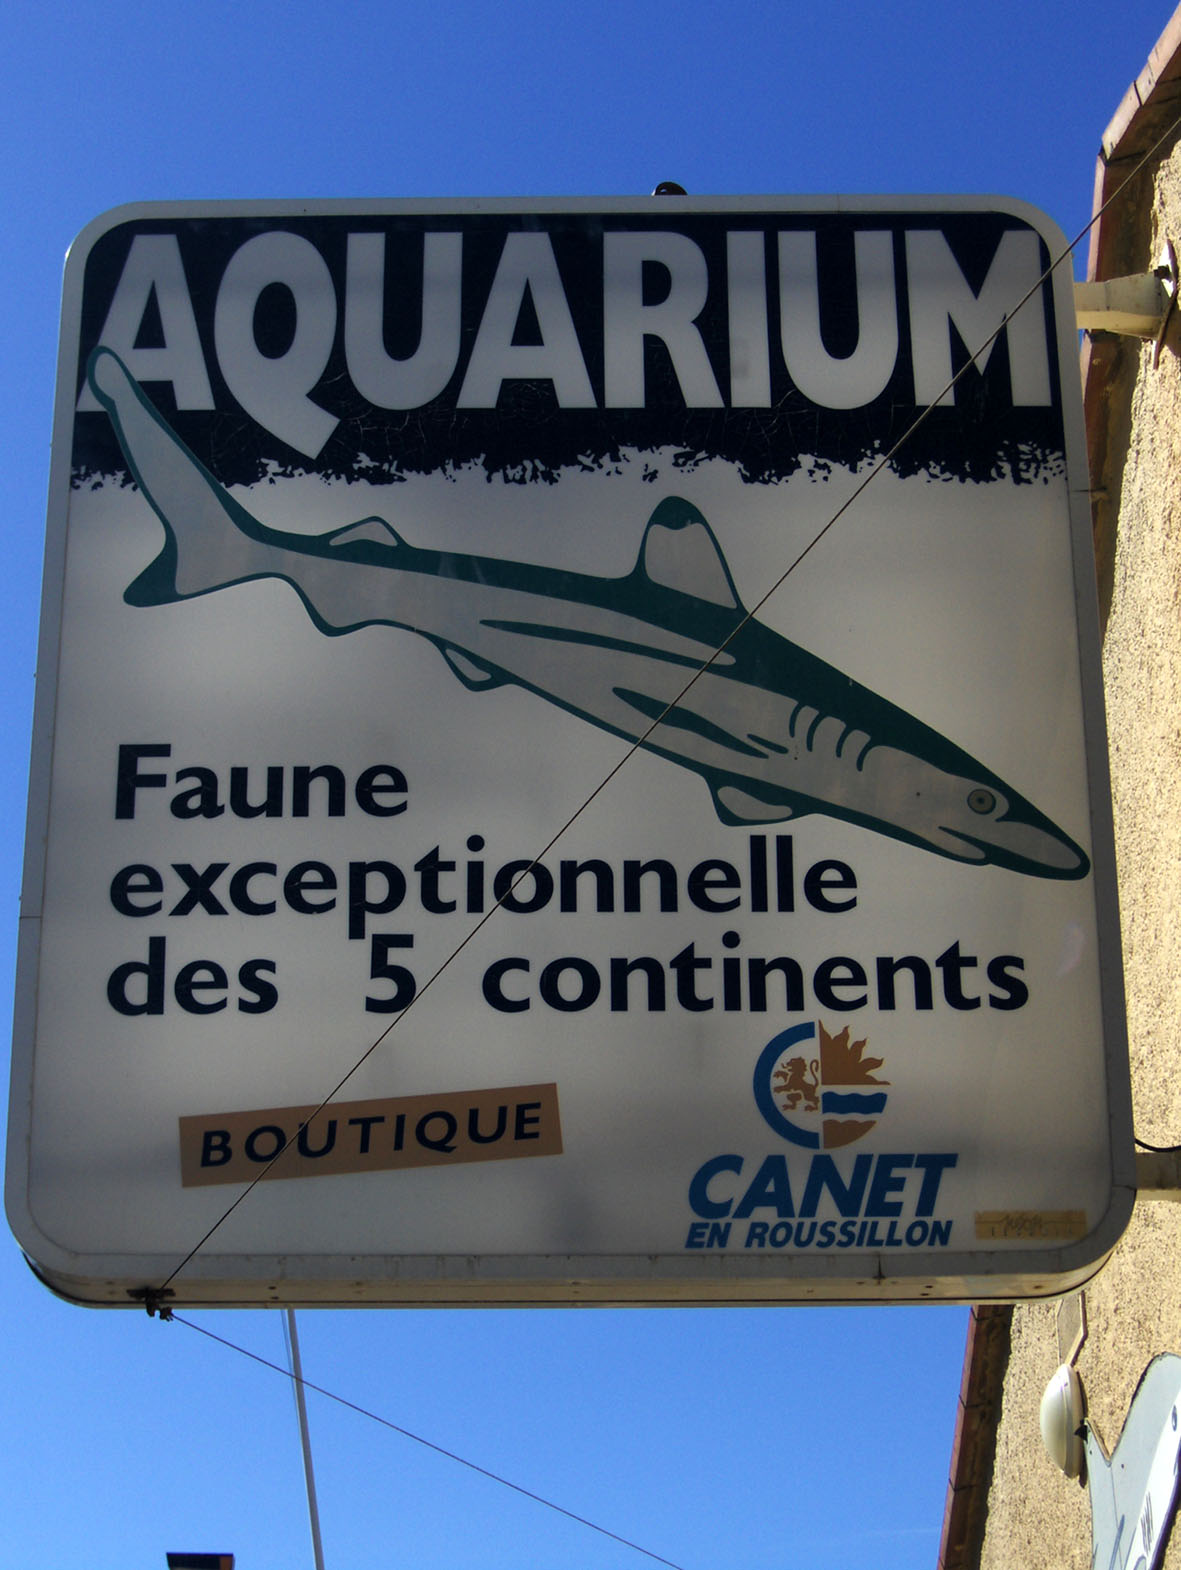 http://2.bp.blogspot.com/-dcIQGMV2_Ek/UF4iUUNjj5I/AAAAAAAACEM/DRIRf_xkuu4/s1600/Aquarium_Canet_en_Roussillon_Panneau.jpg